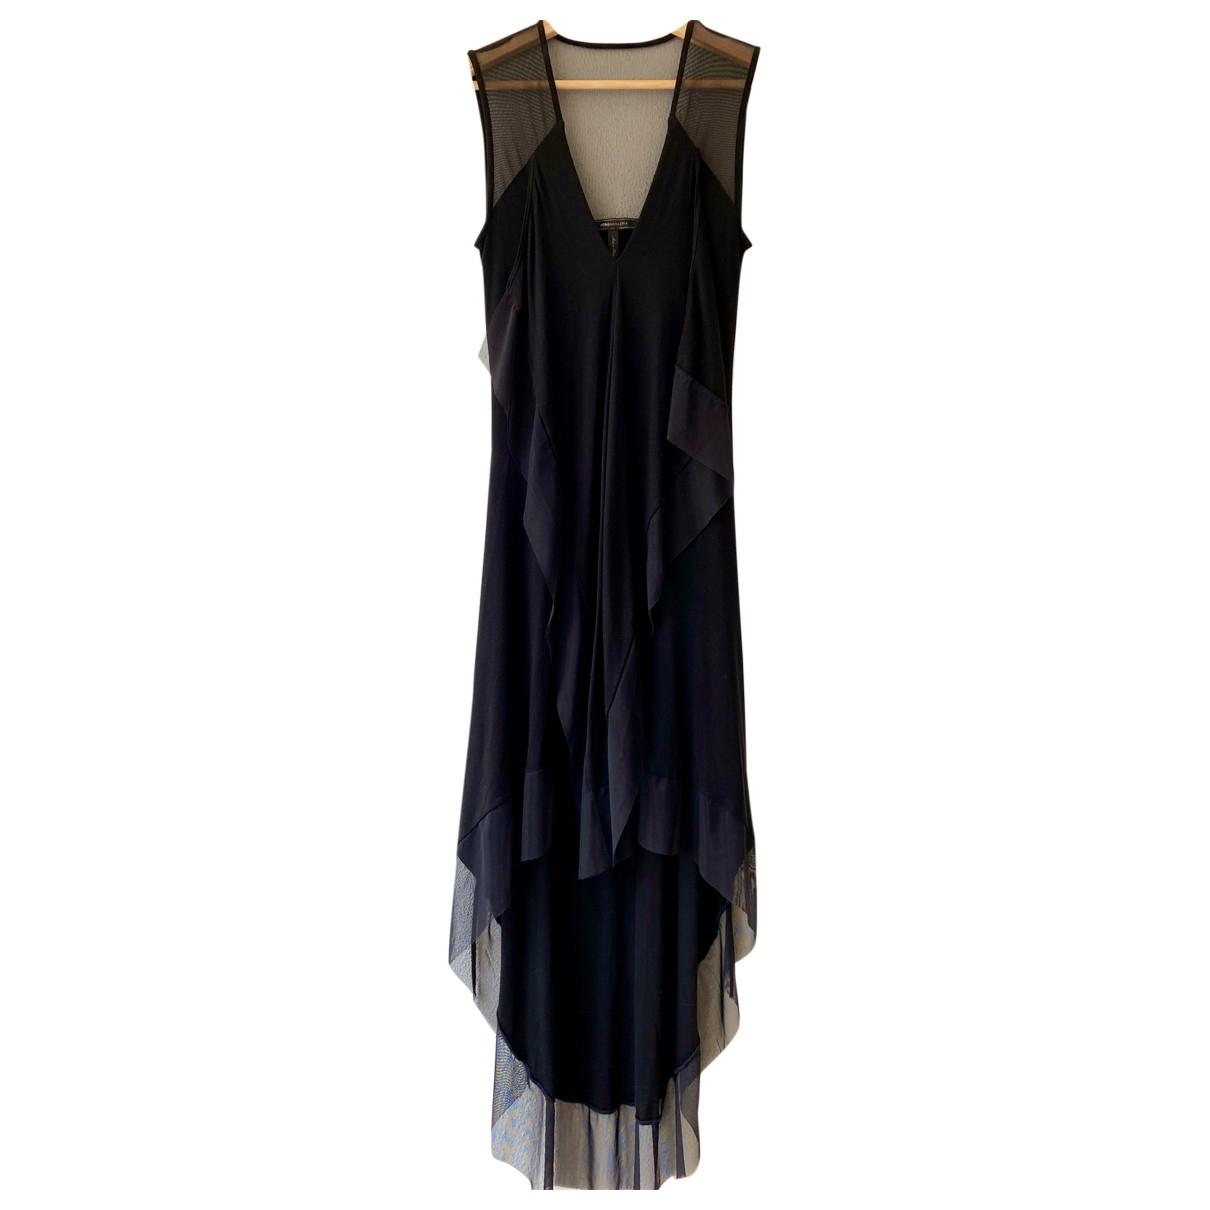 Maxi vestido de Lana Bcbg Max Azria